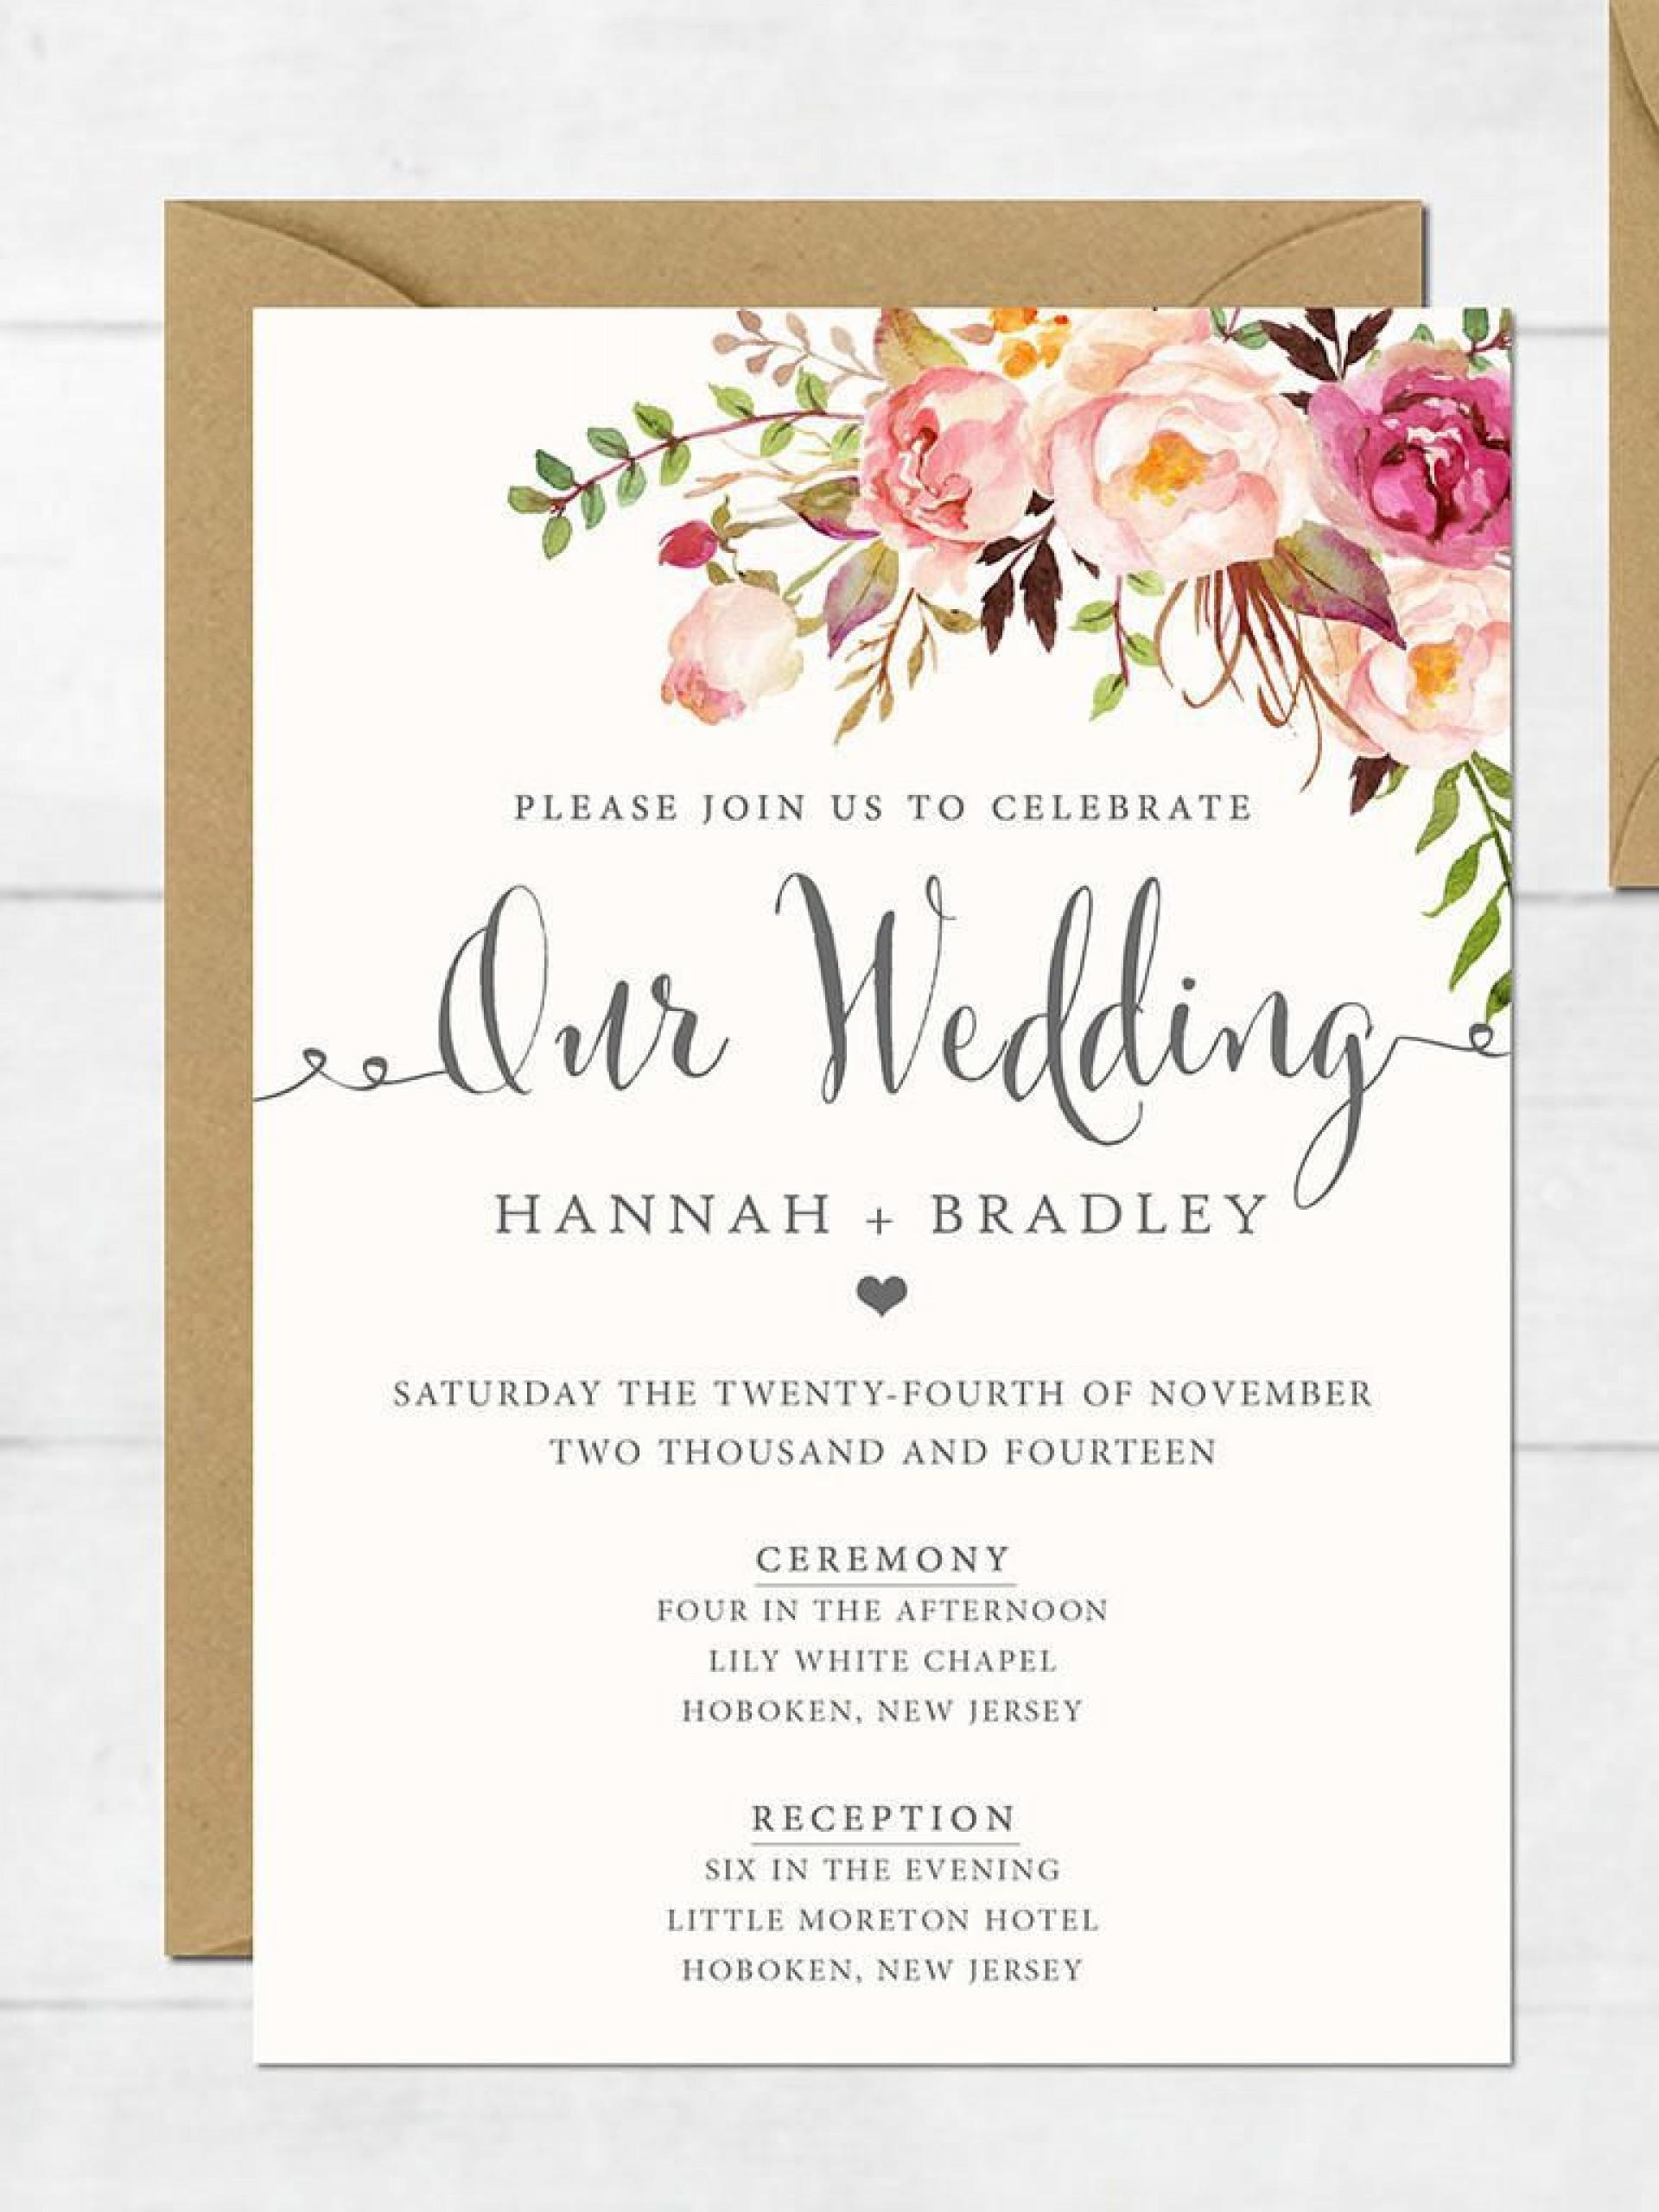 004 Incredible Sample Wedding Invitation Template  Templates Wording Card1920